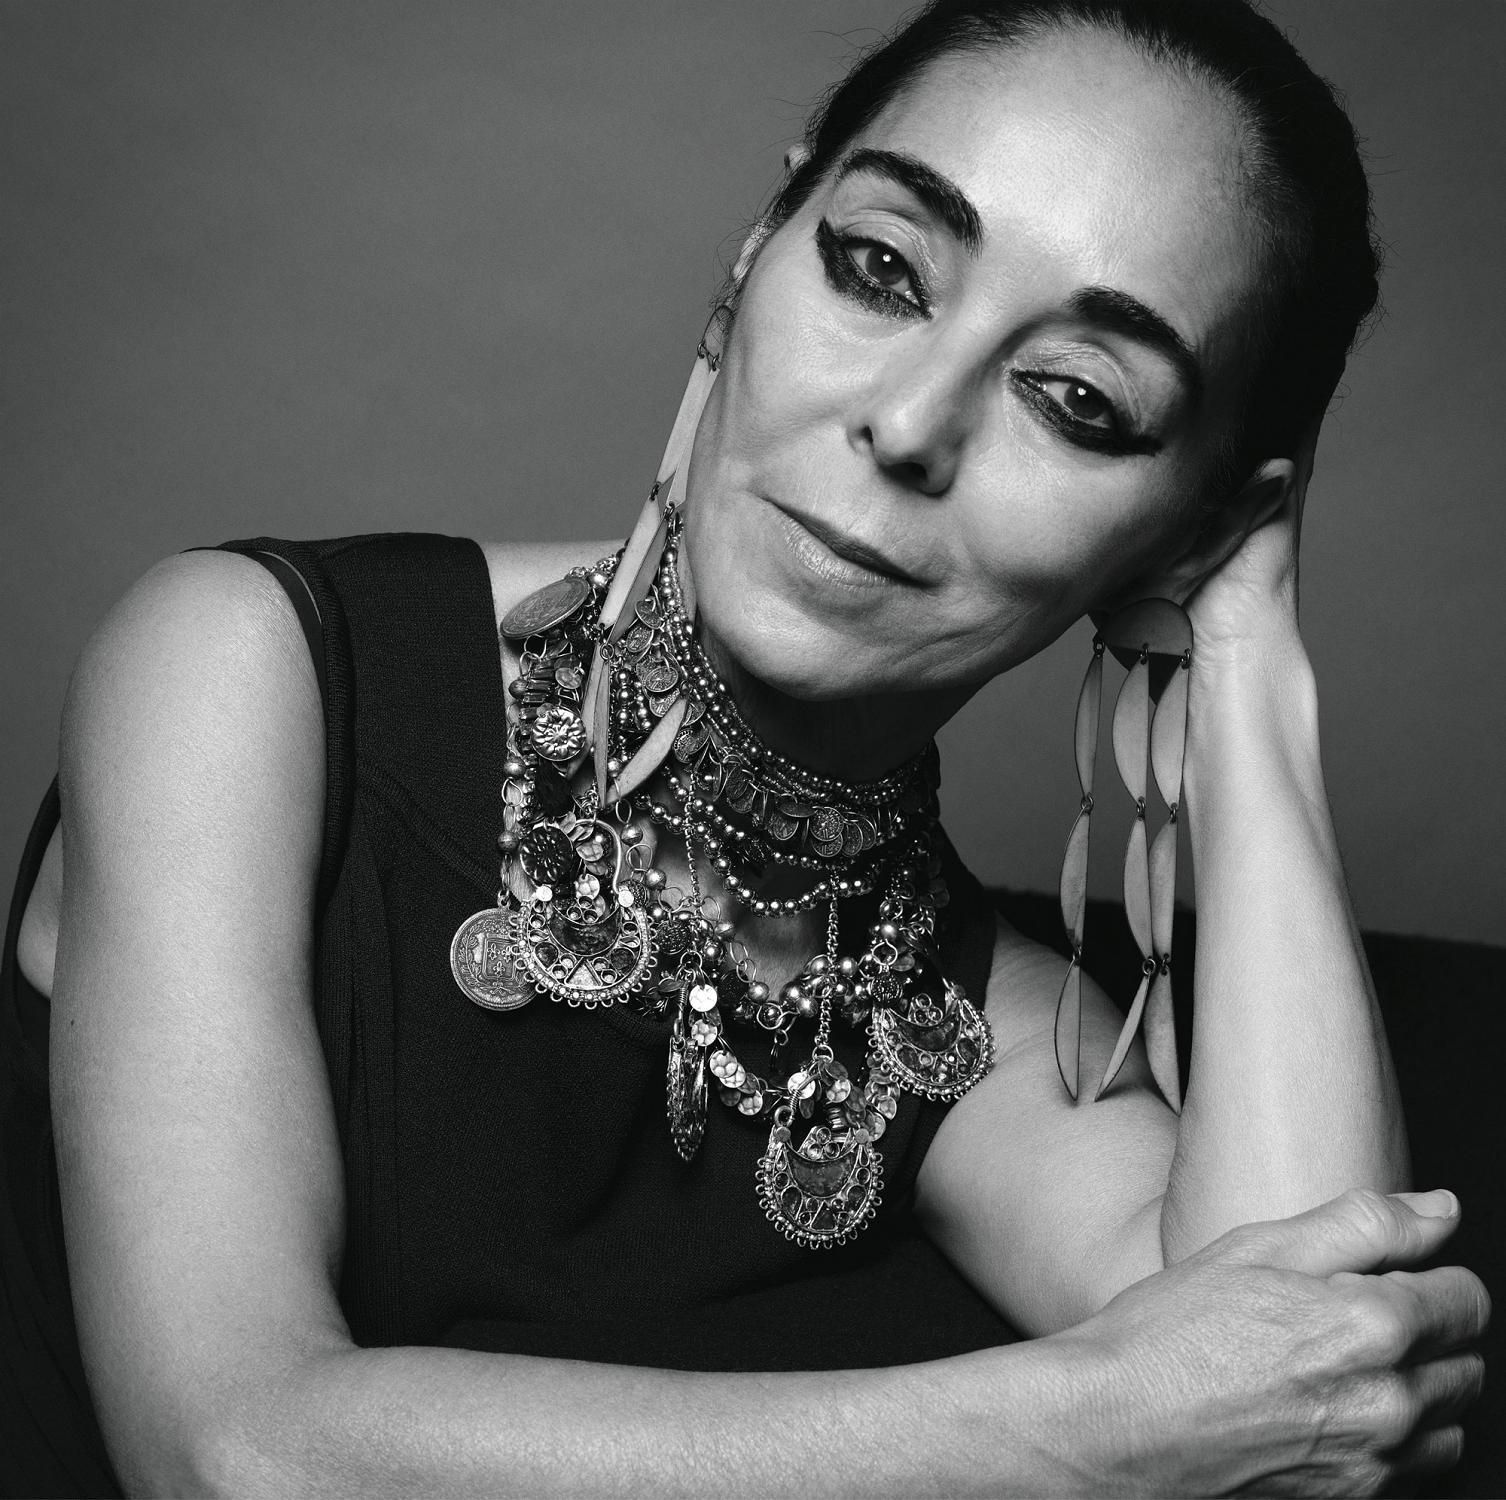 The Gentlewoman – Shirin Neshat